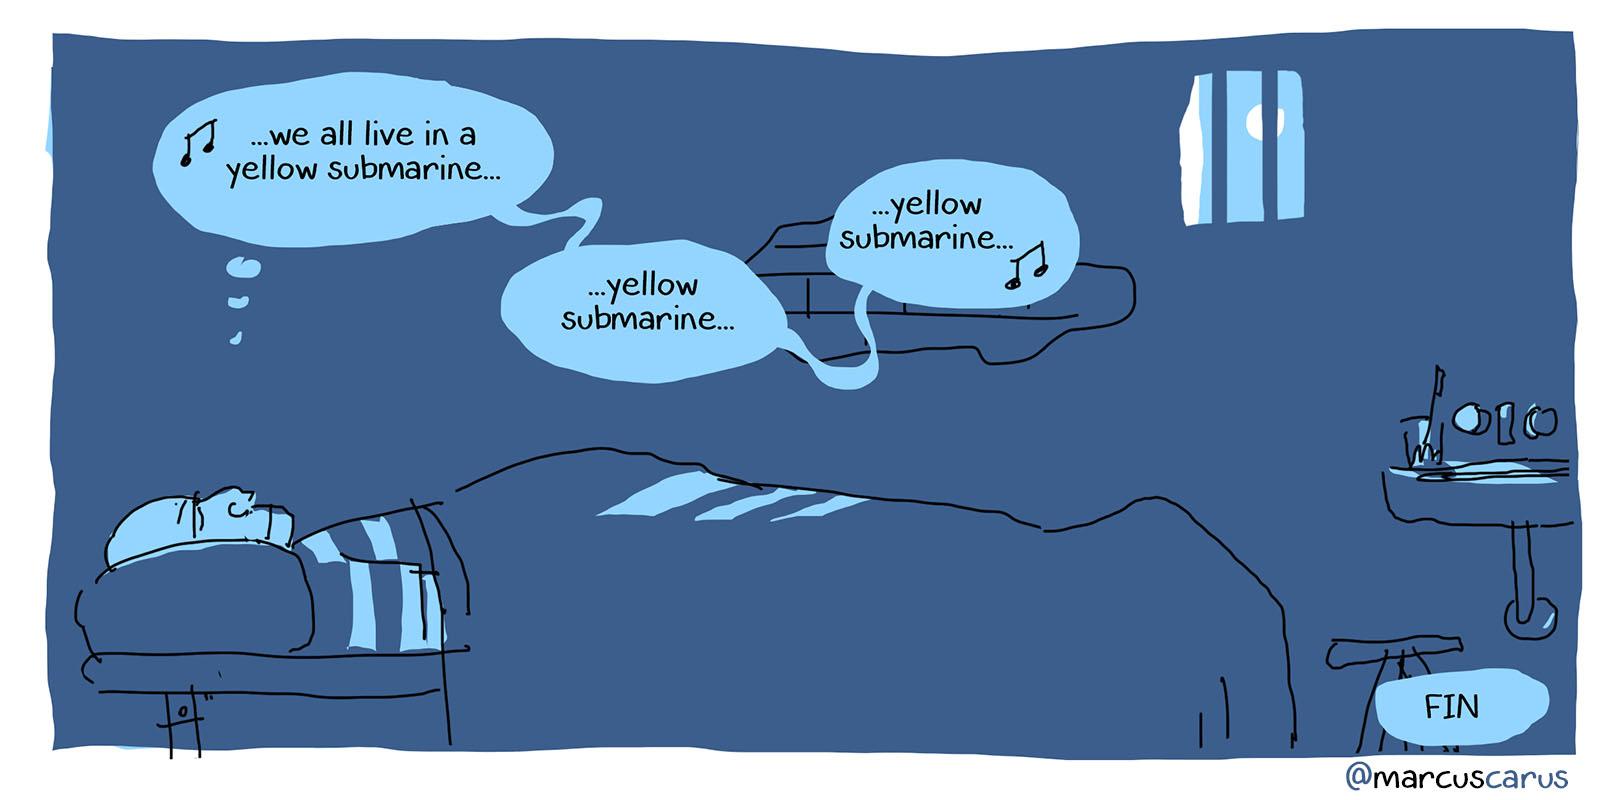 comic amigos facebook redes sociales historias soledad john lennon cárcel jail chapman